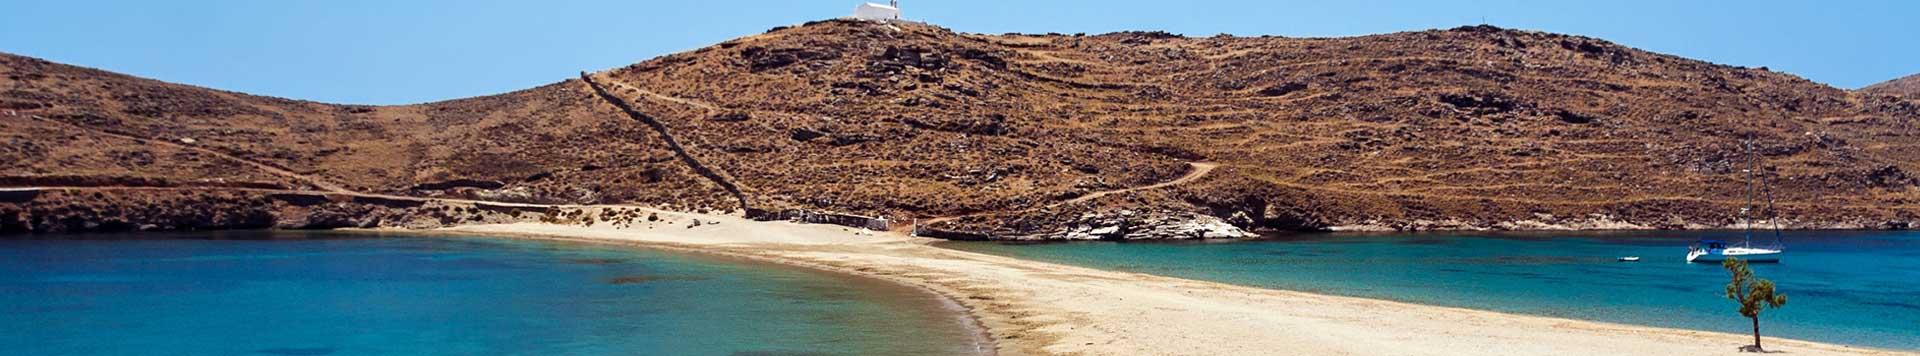 vacanza in barca a vela Grecia